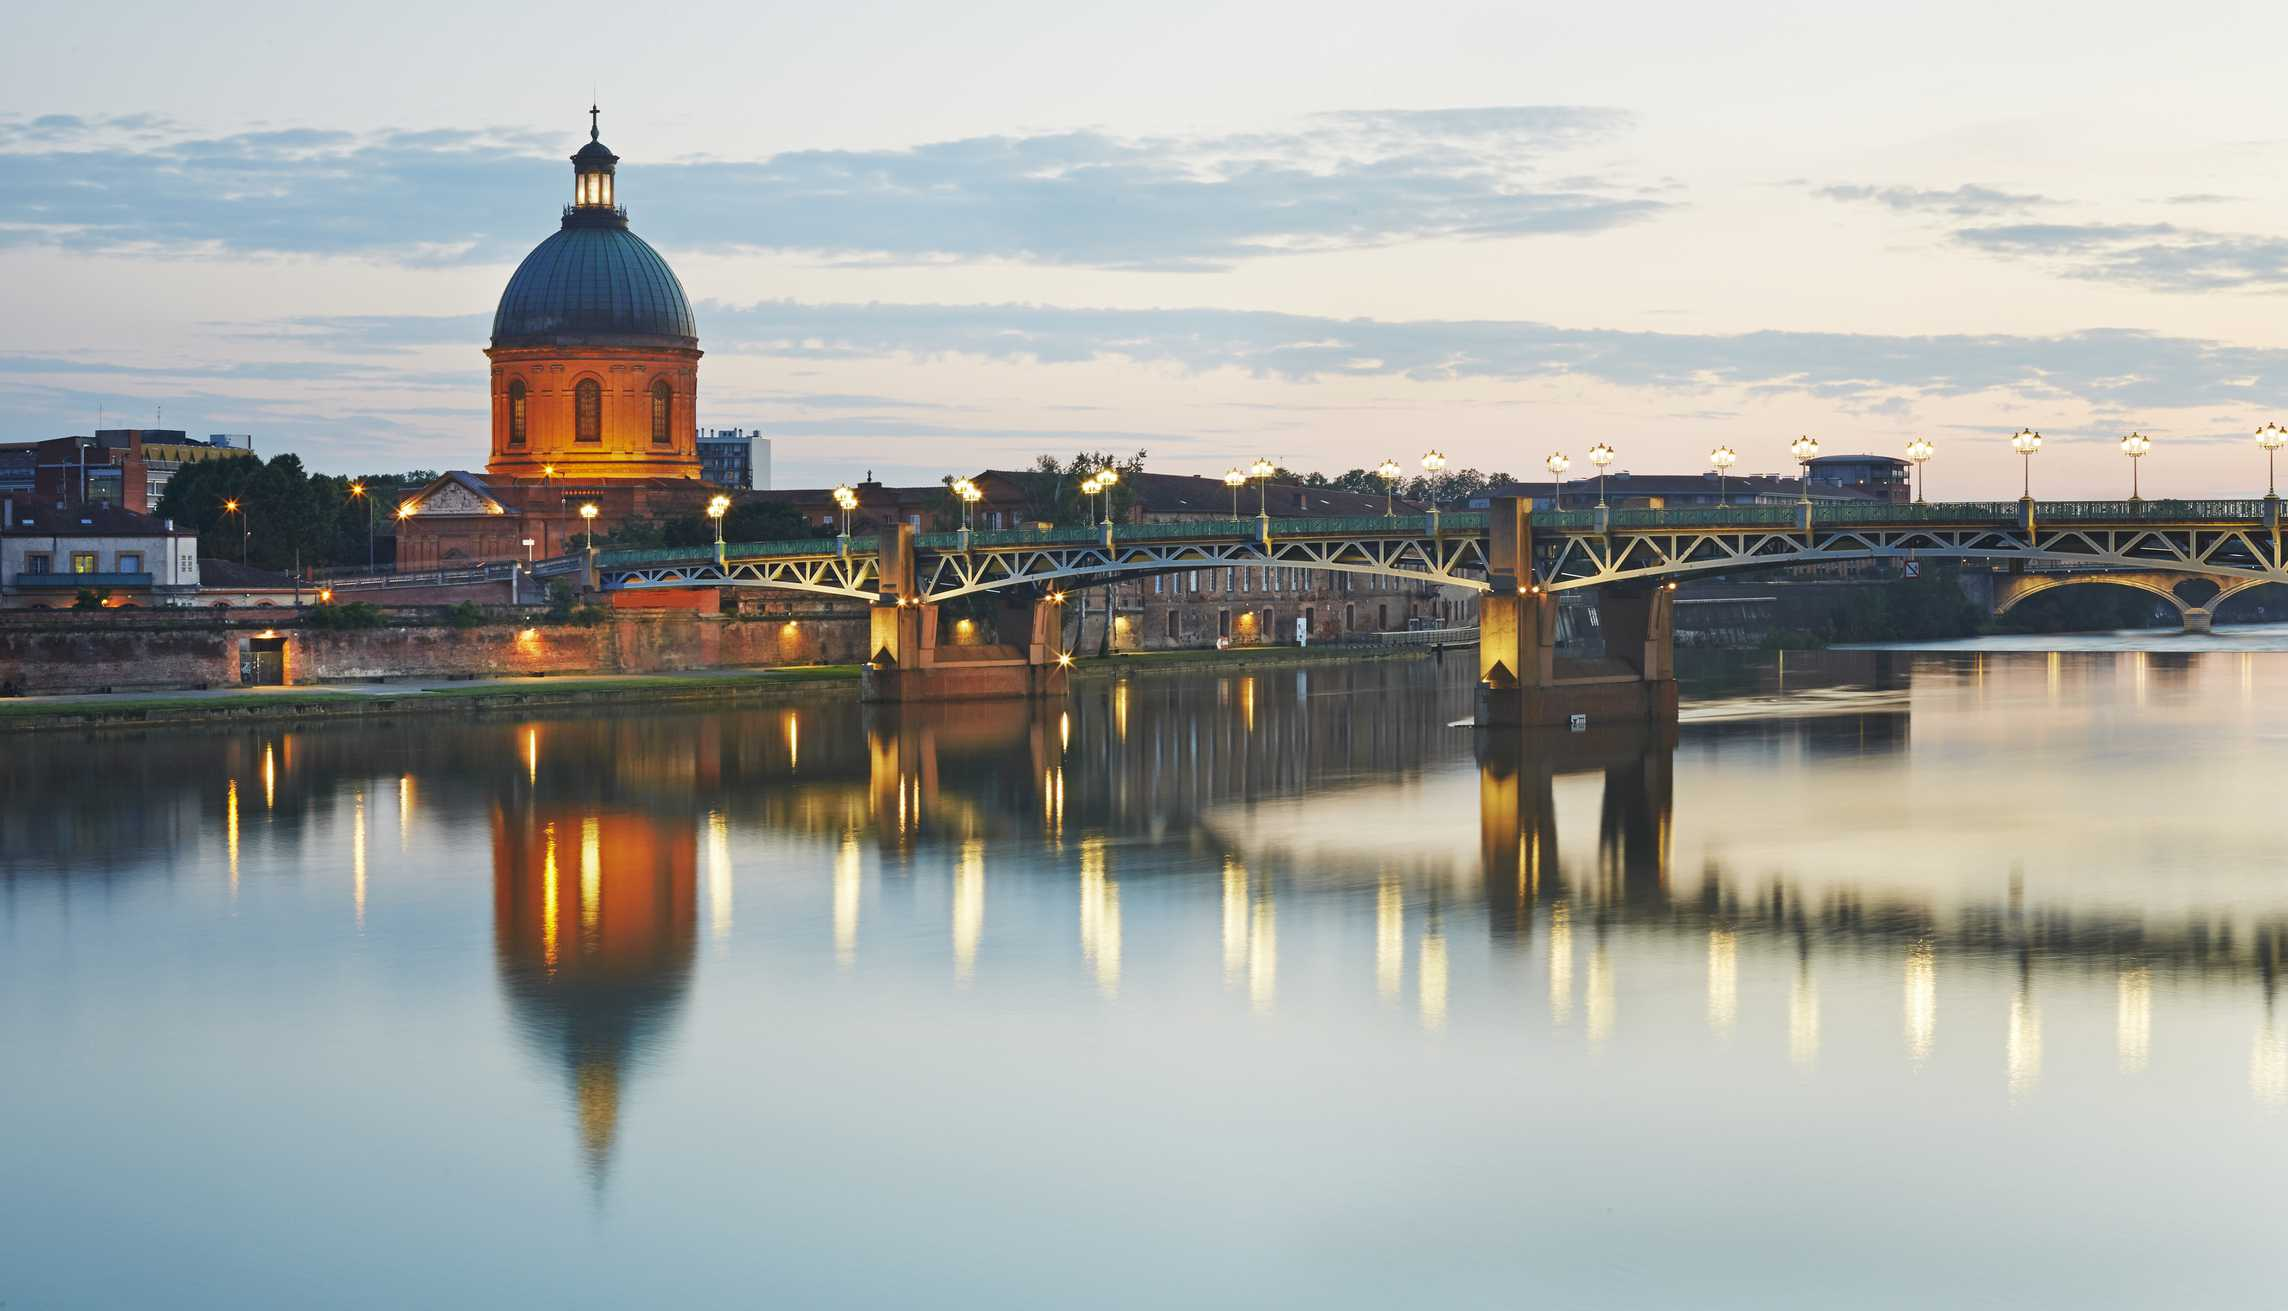 The dome of the 'Hopital de la Grave' with 'Pont Saint -Pierre' girder bridge illuminated at dusk over the Garonne River